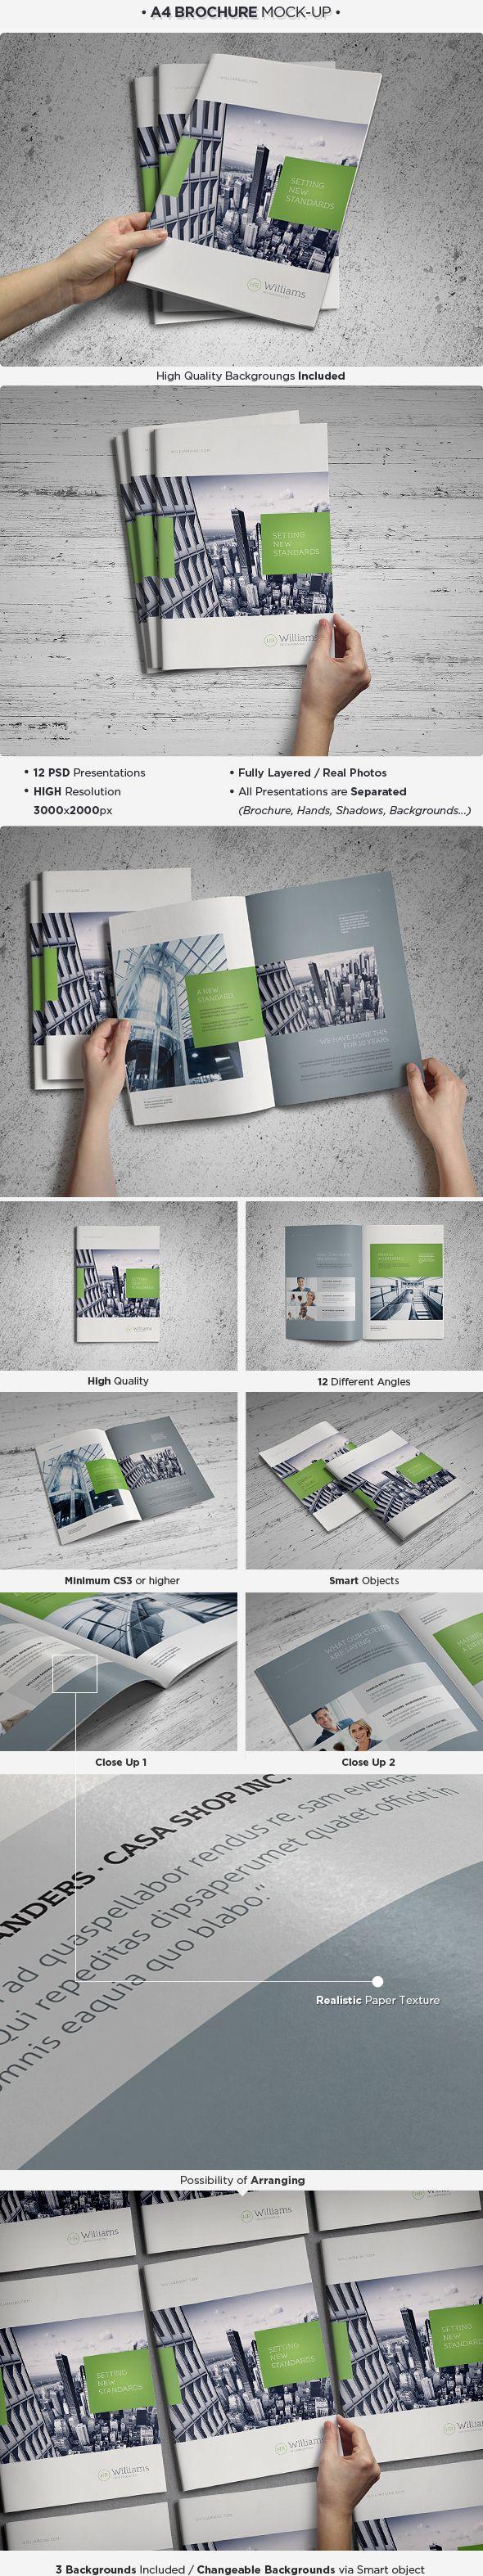 A4 Brochure / Catalog Mockup by Pune , via Behance